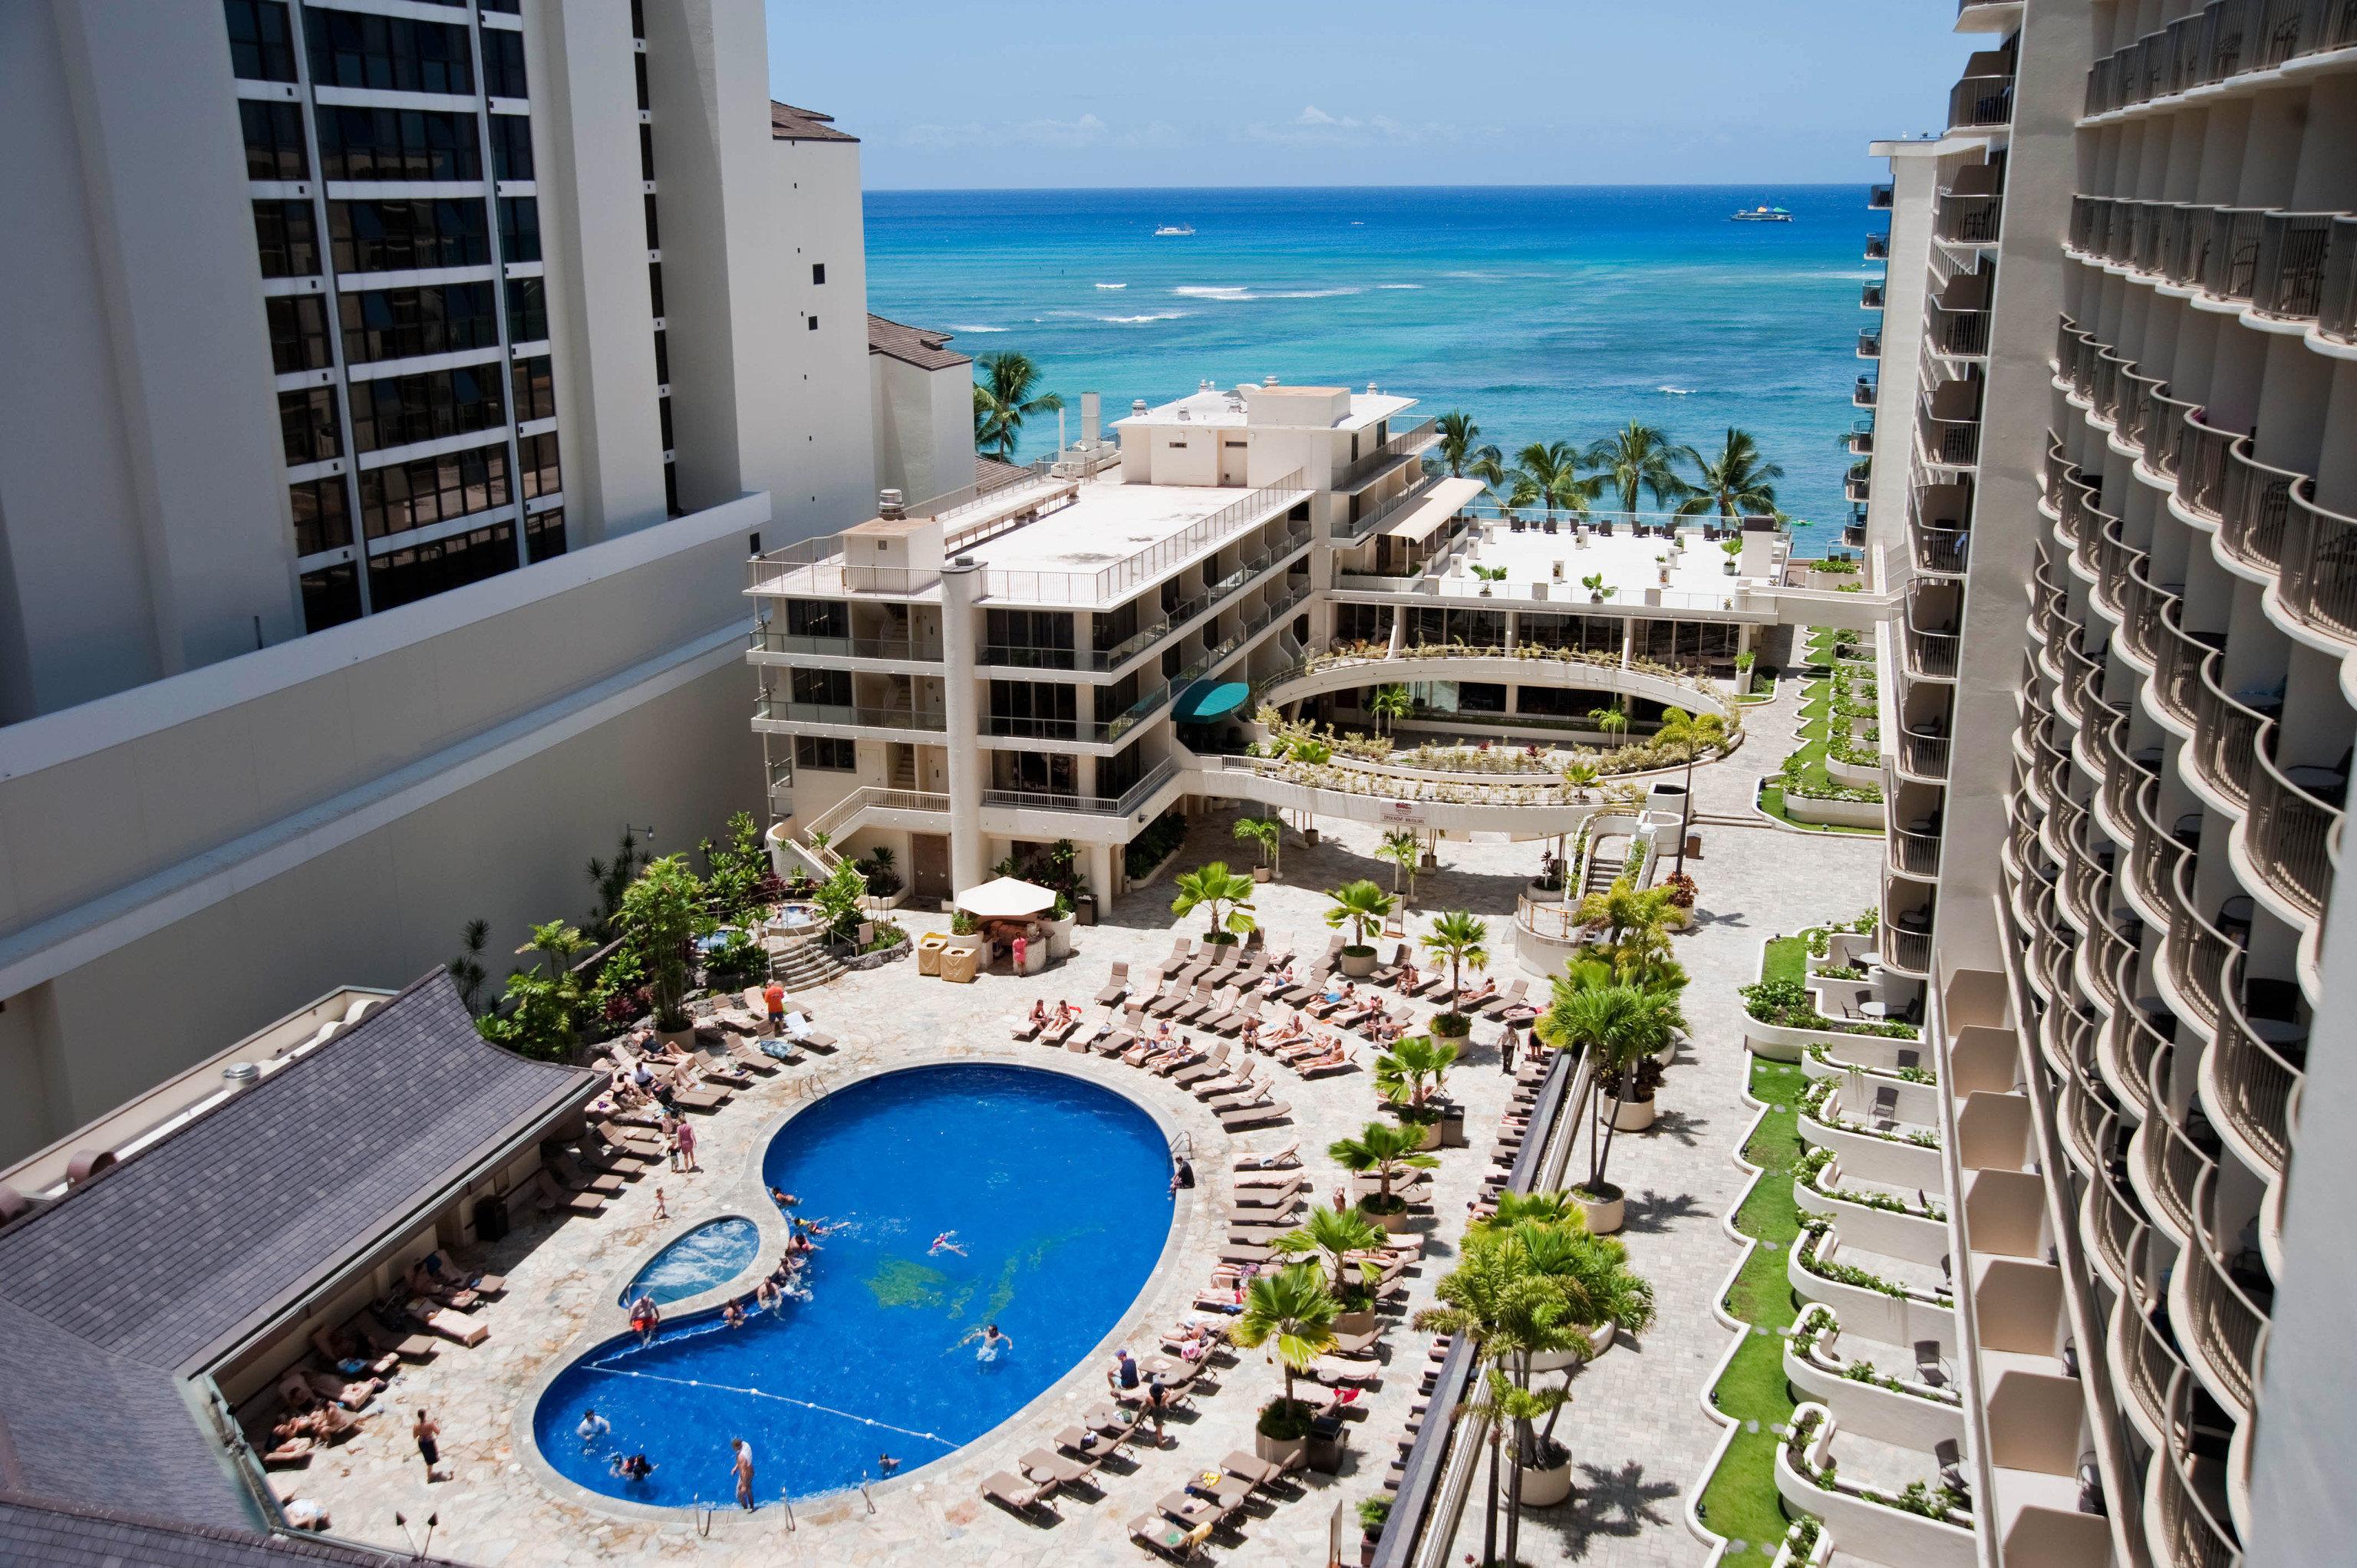 condominium property swimming pool leisure Resort marina mansion dock Villa shore